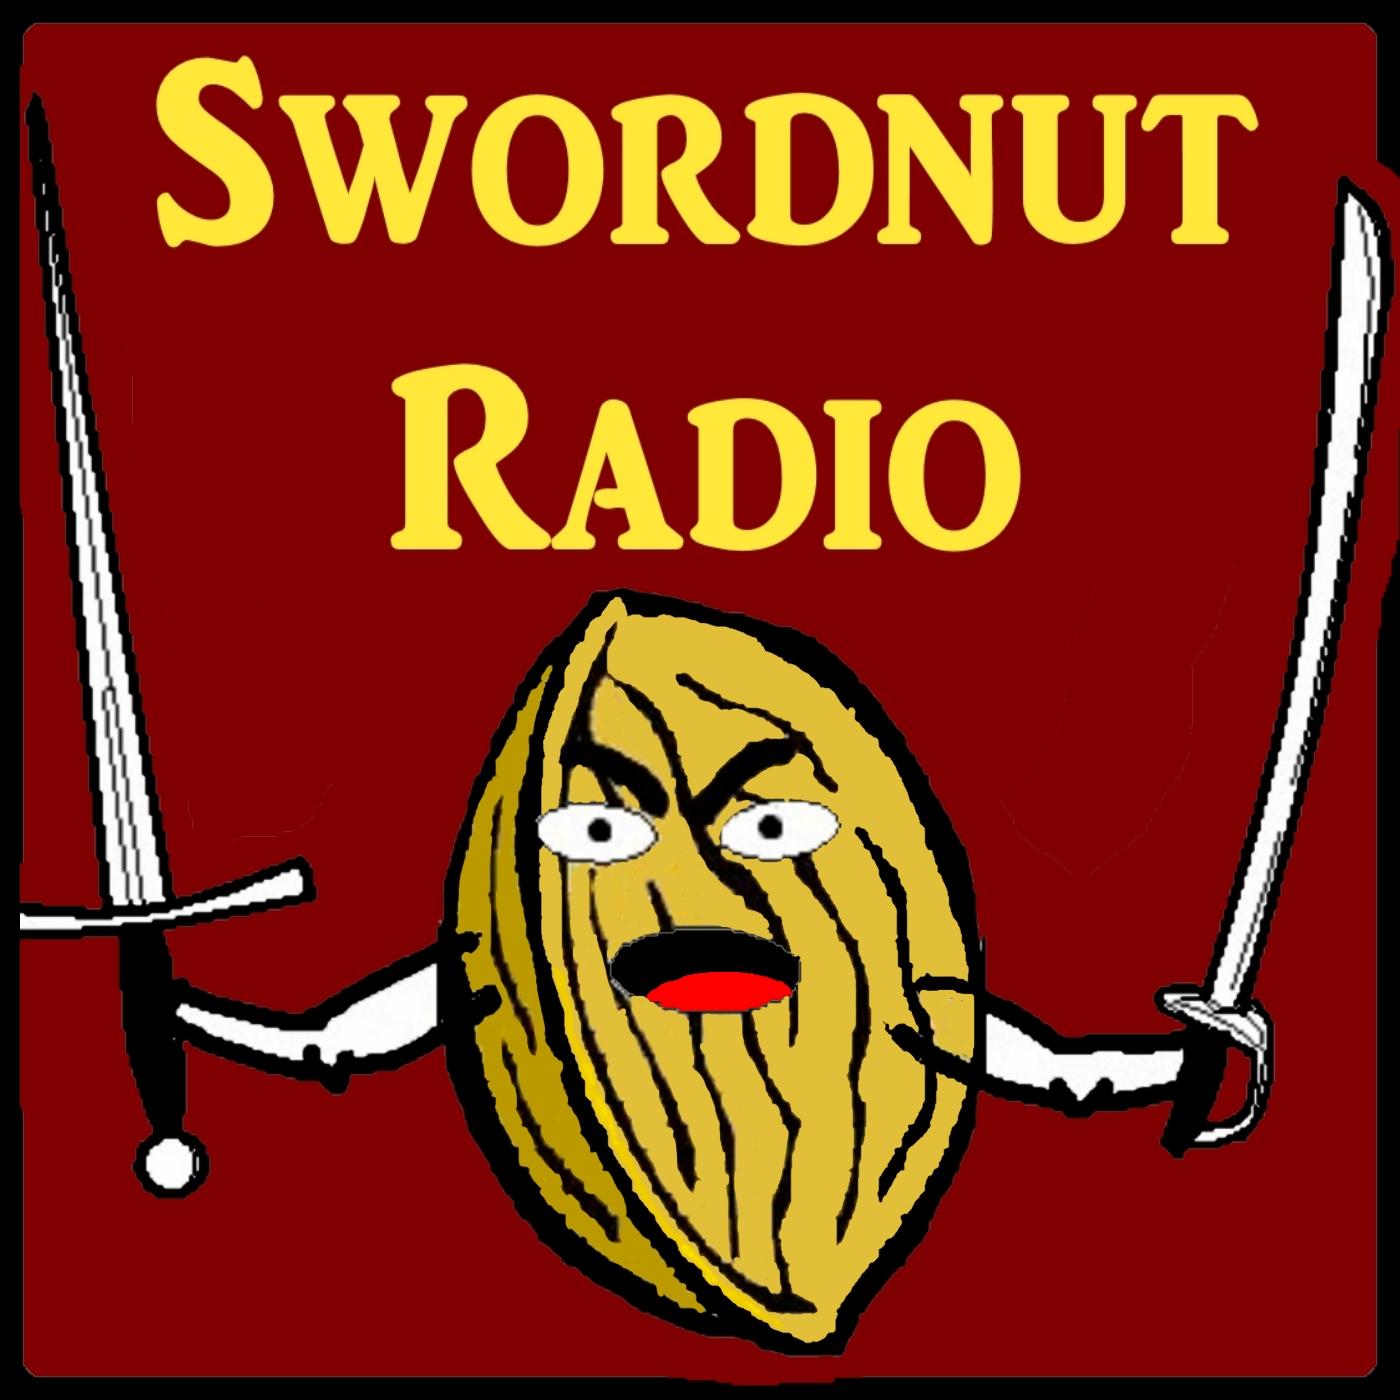 swordnutradio2.jpg